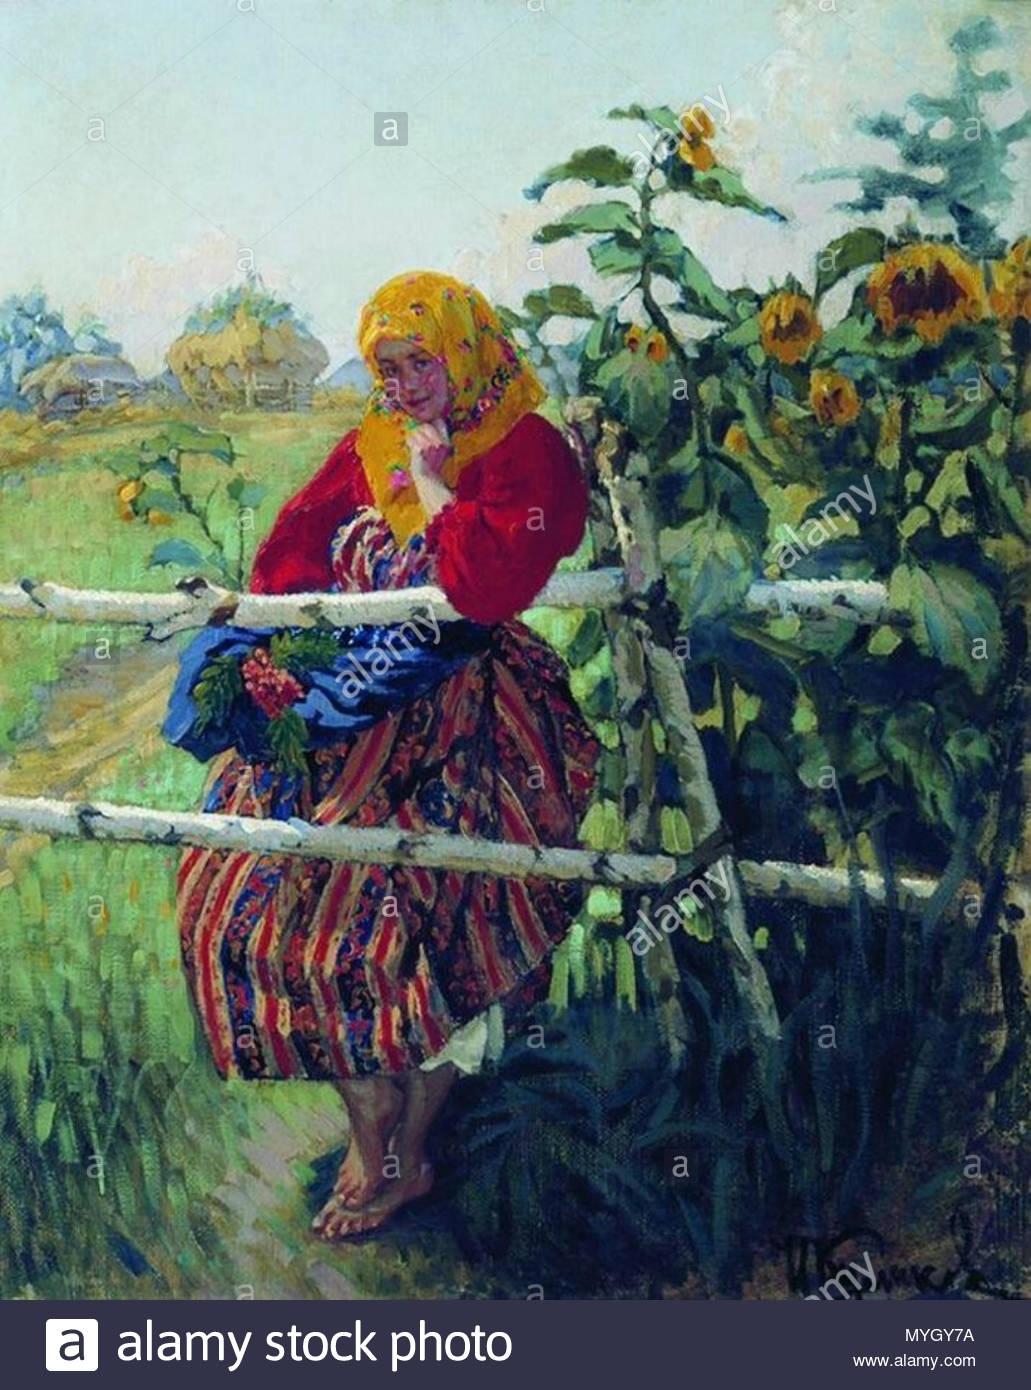 Russian: «У Околицы» At The Outskirts  1913 Ivan Koulikov